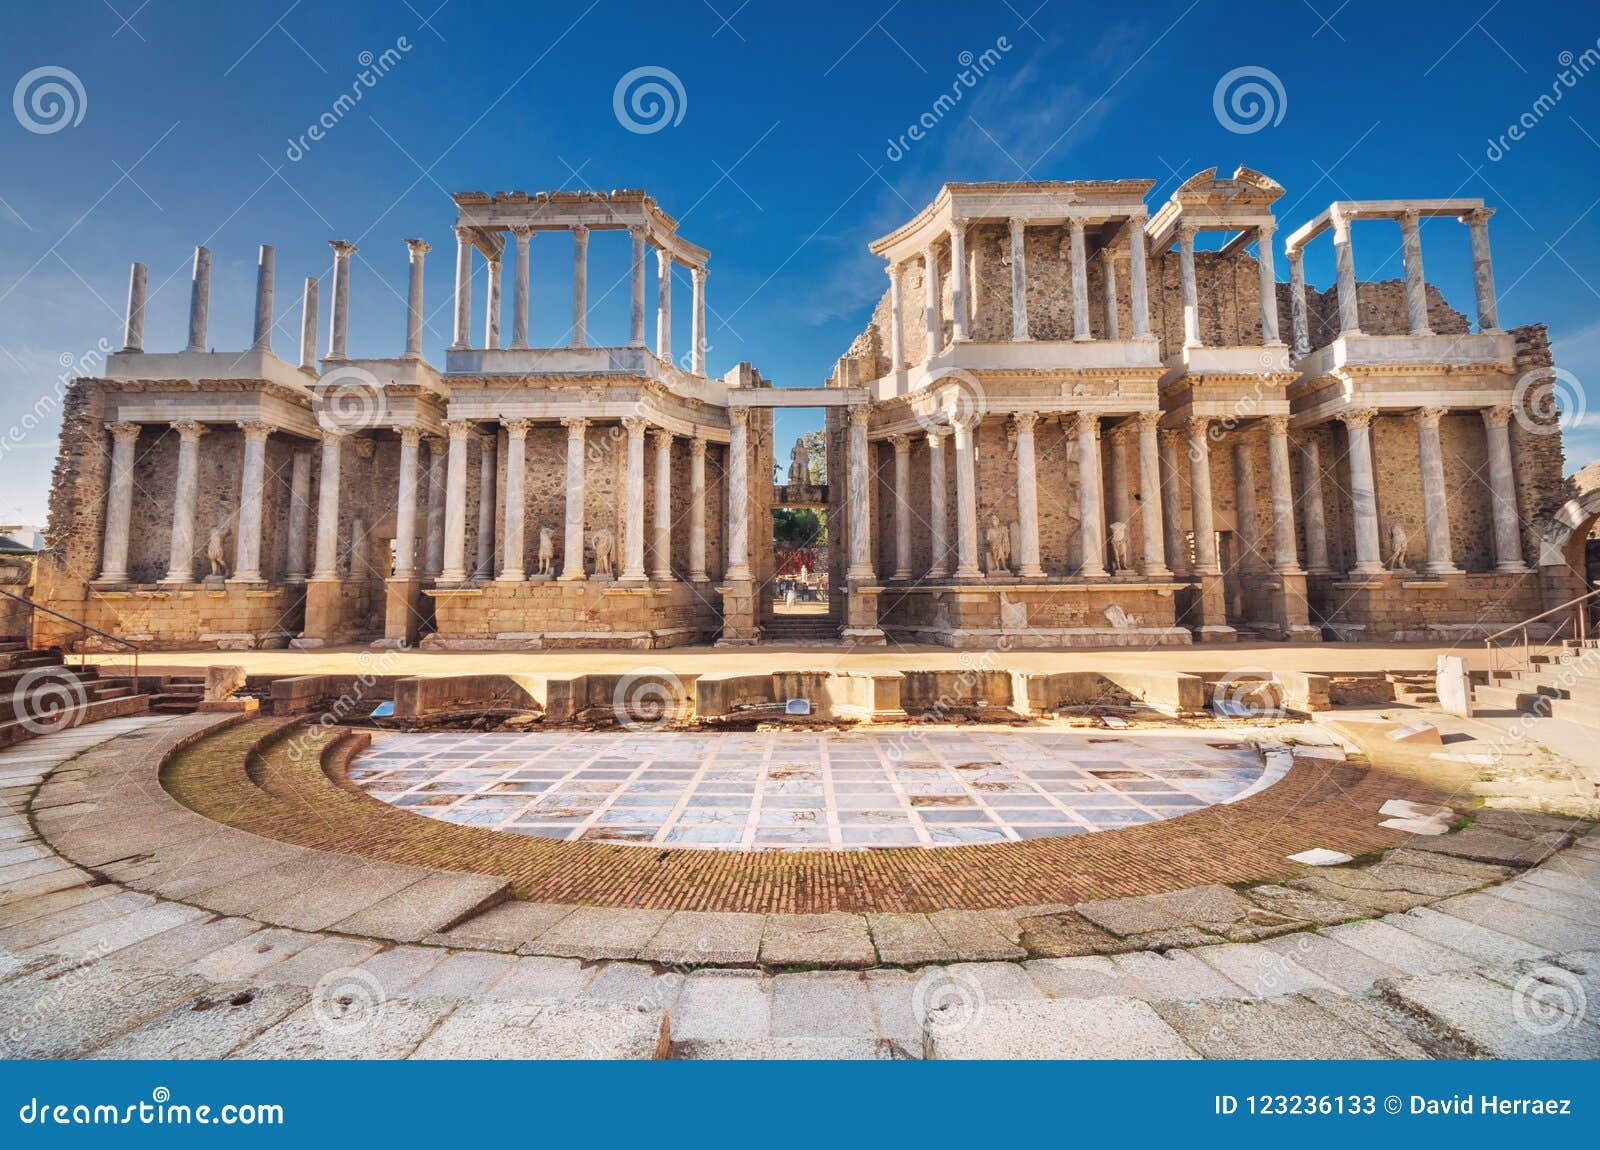 Teatro romano de Mérida, Mérida, Extremadura, España